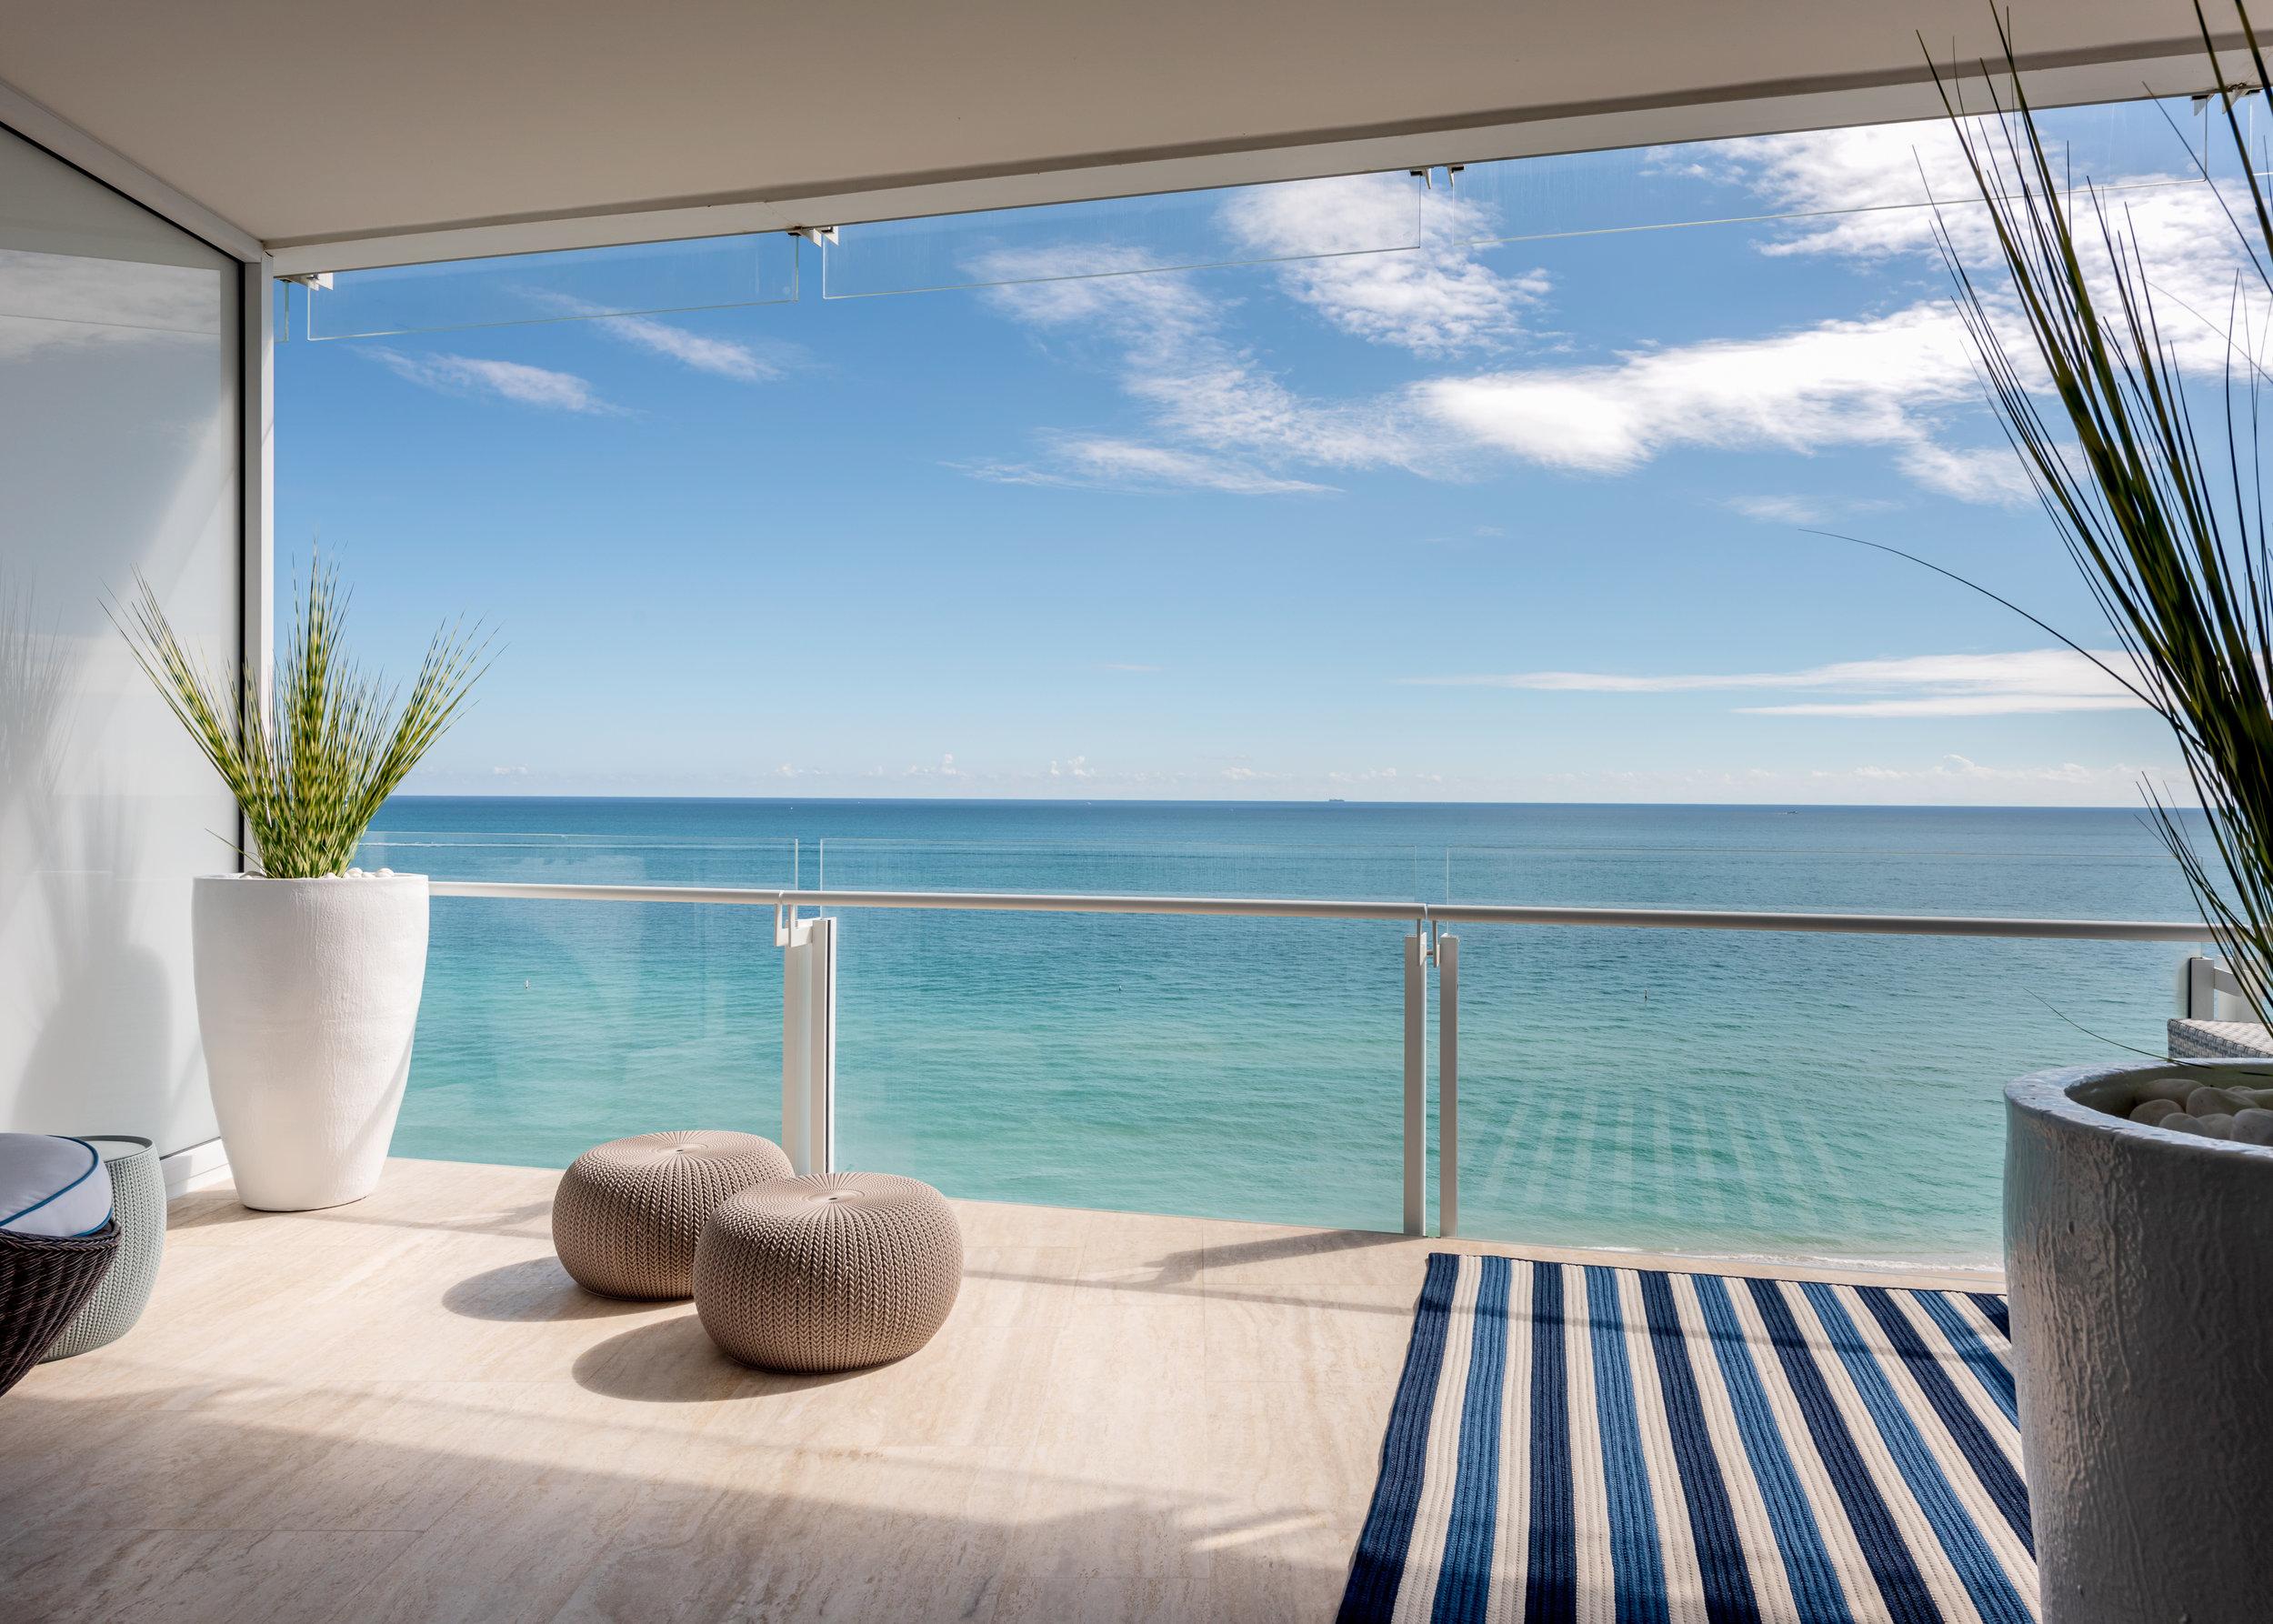 Architecture Photography Miami-2.jpg